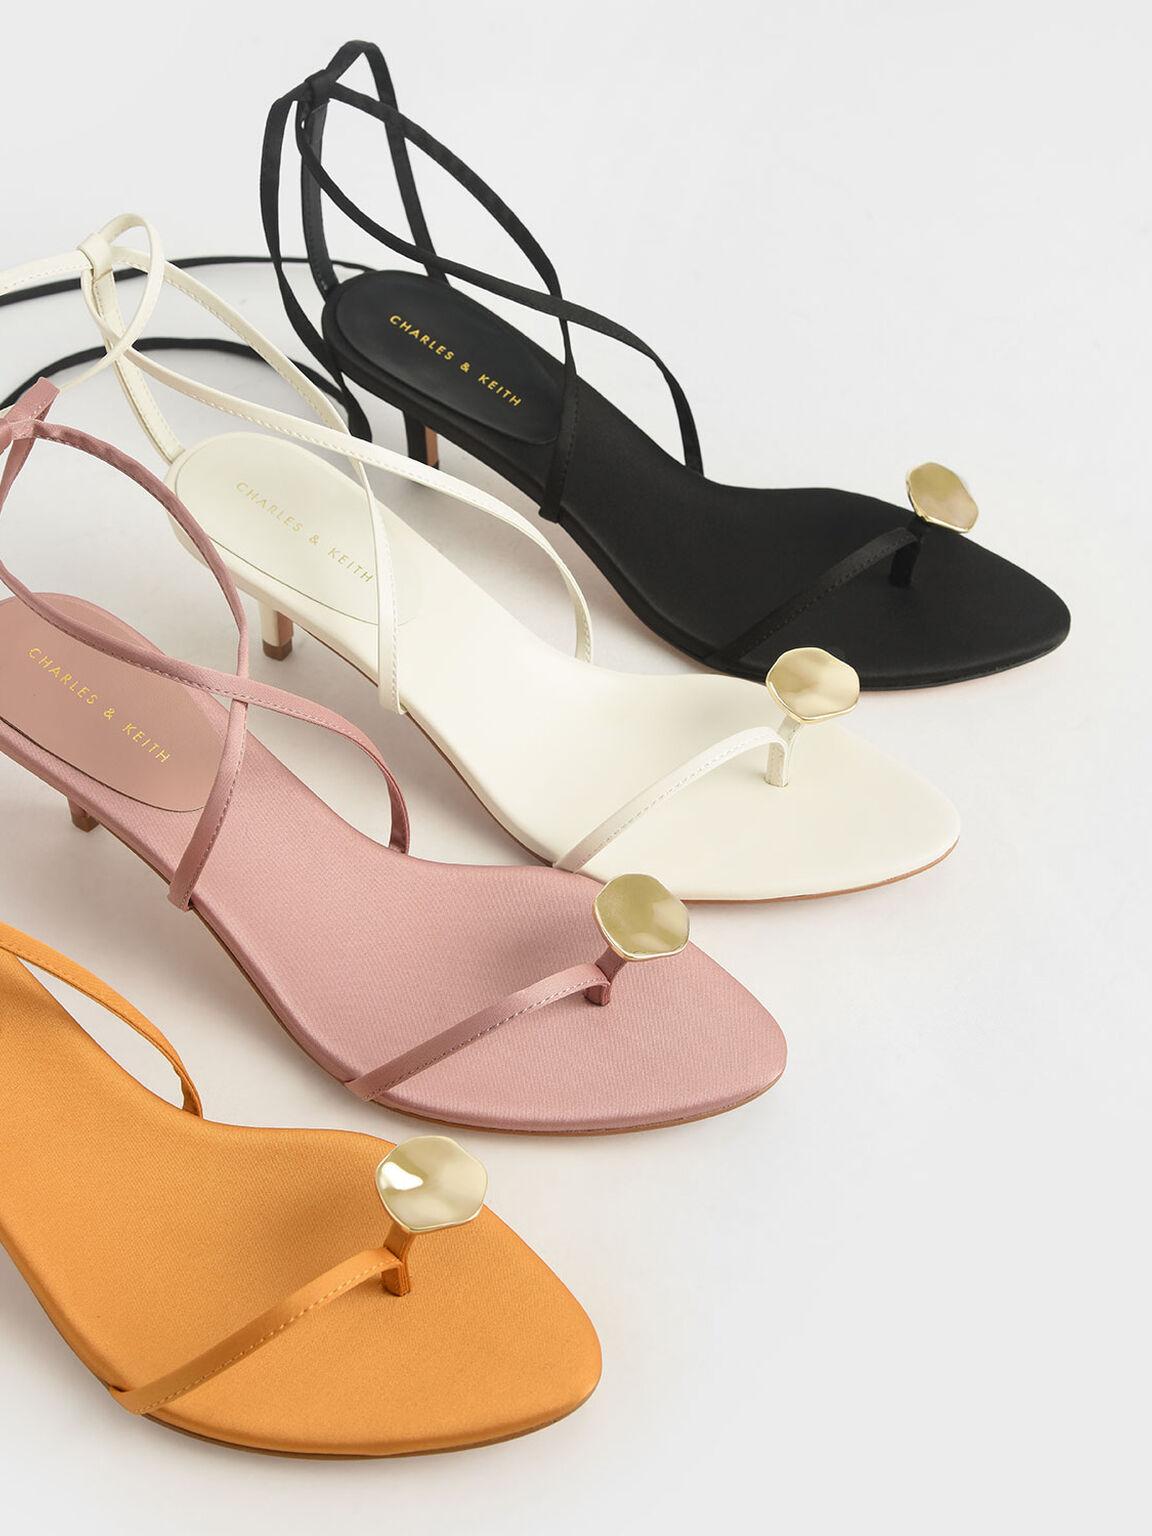 Metal Accent Sandals, Cream, hi-res